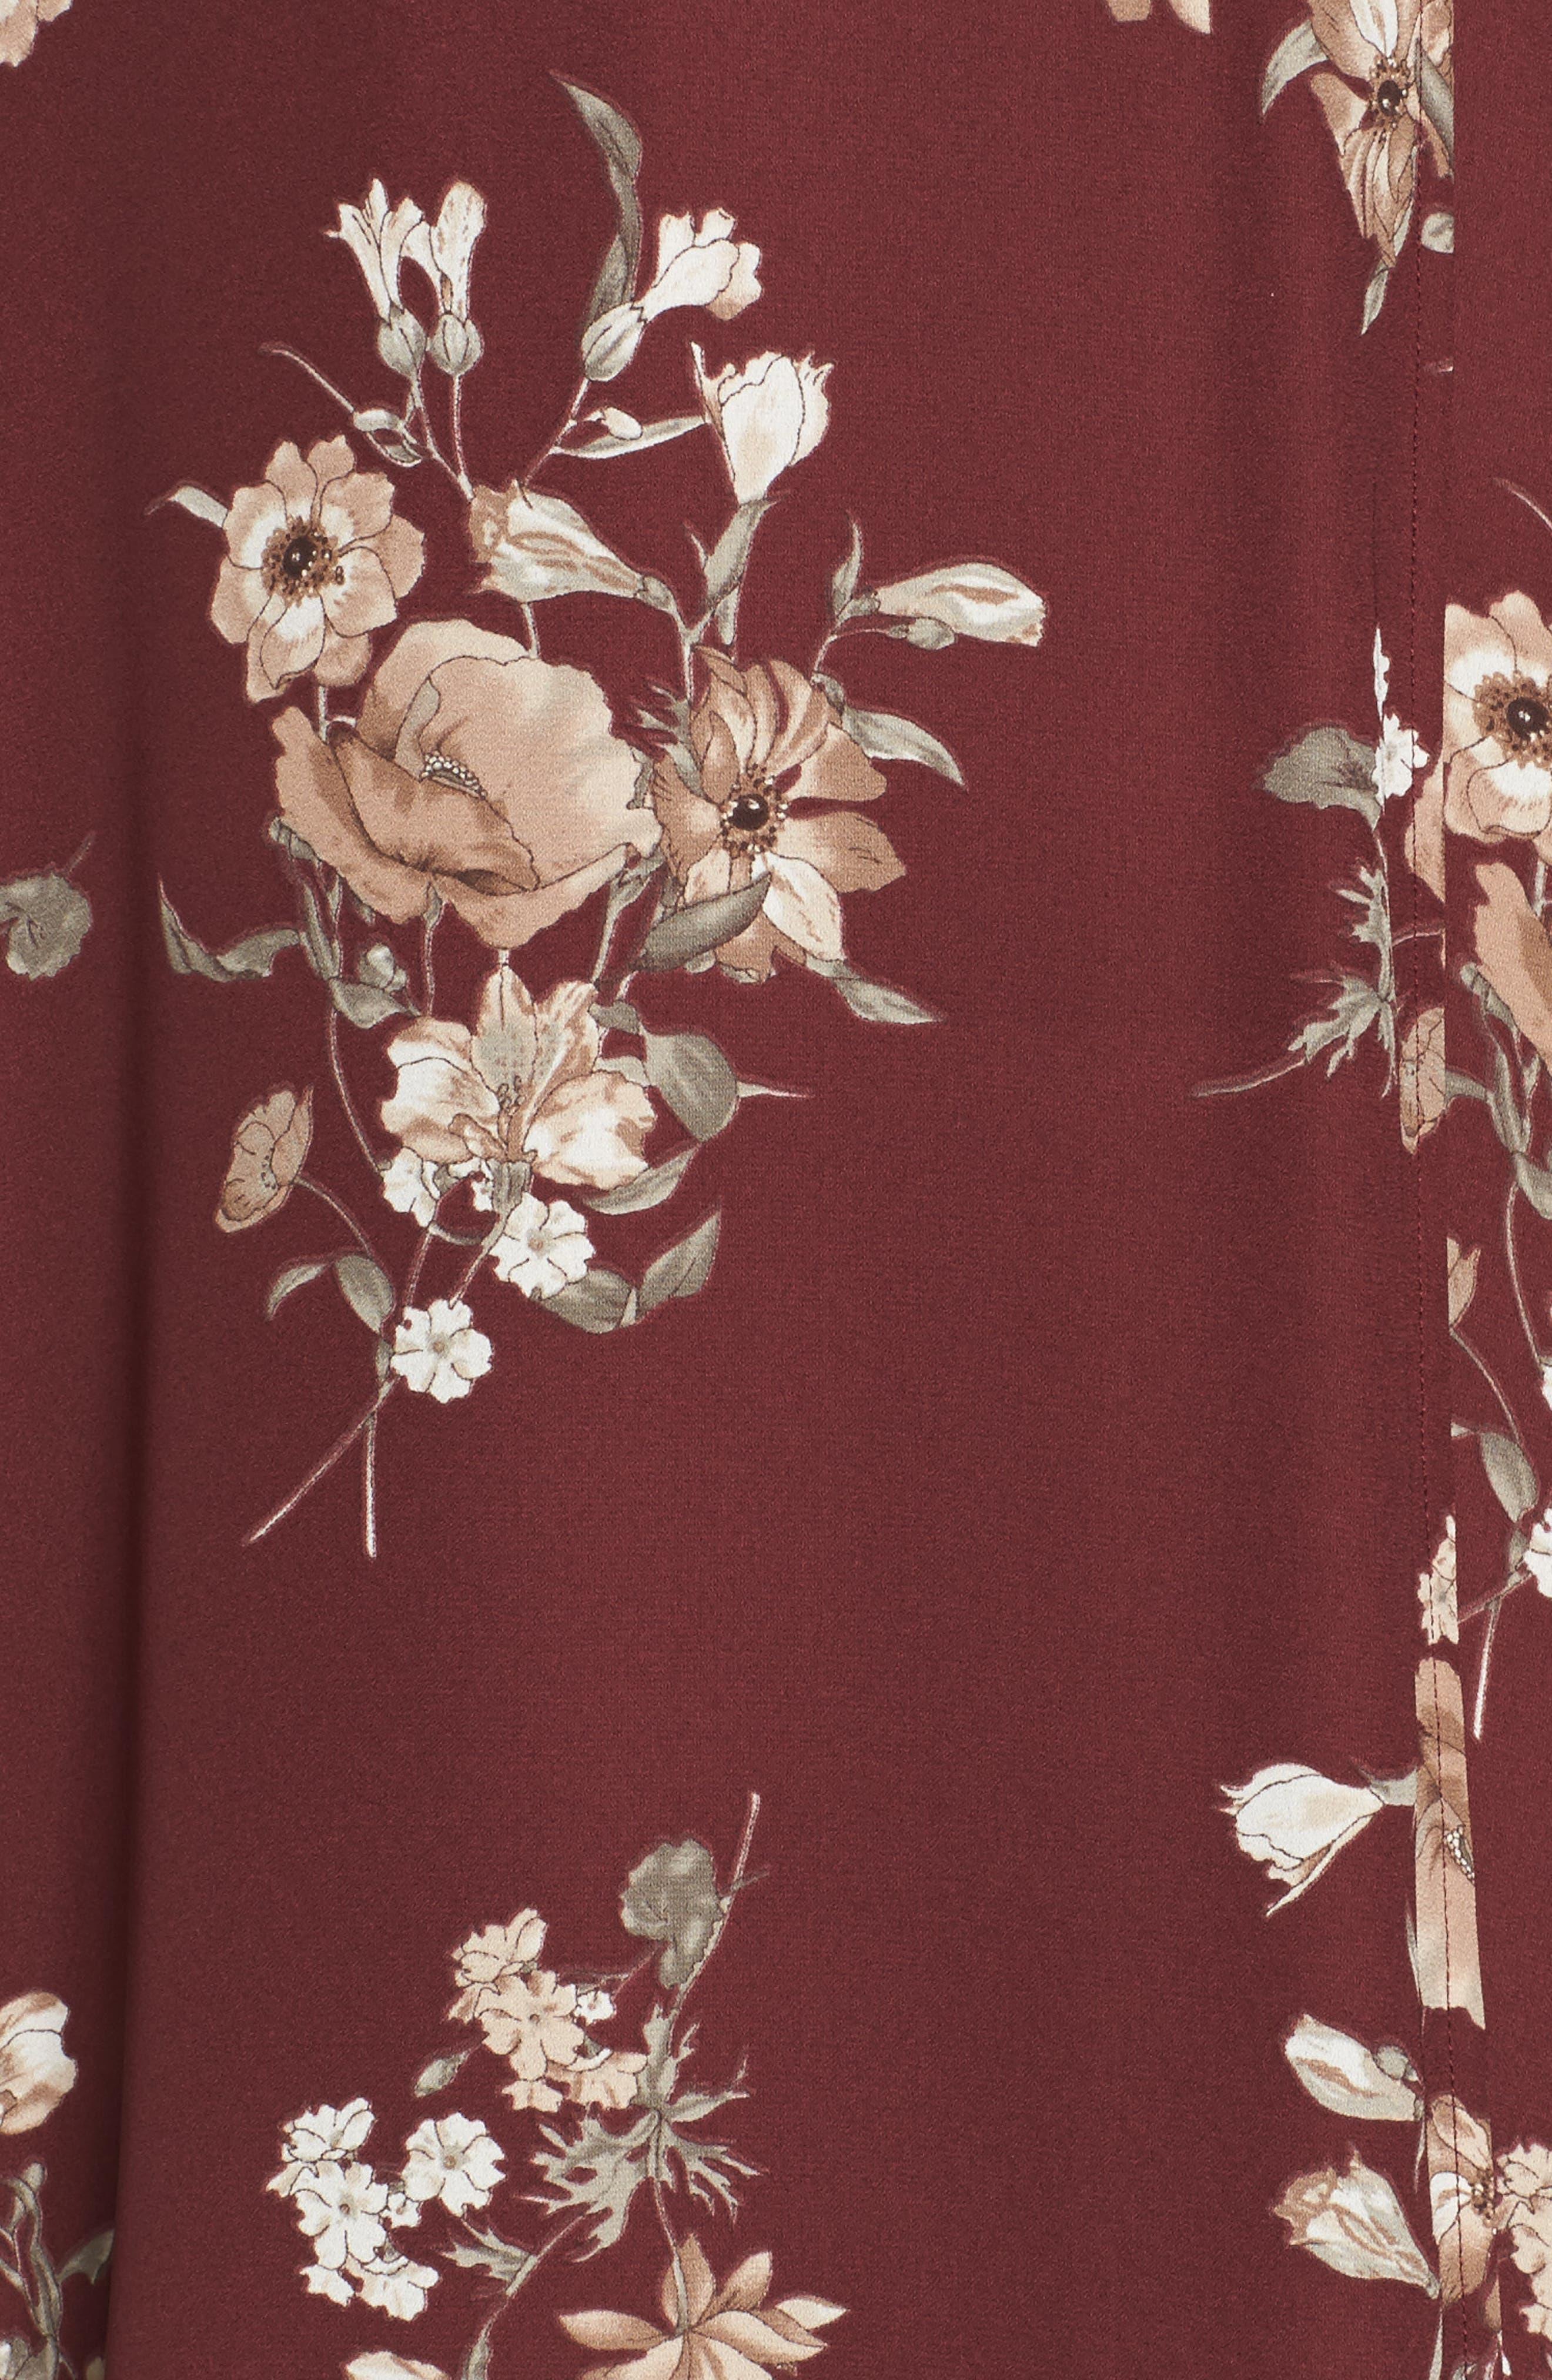 Elly Wrap Dress,                             Alternate thumbnail 5, color,                             Burgundy Floral